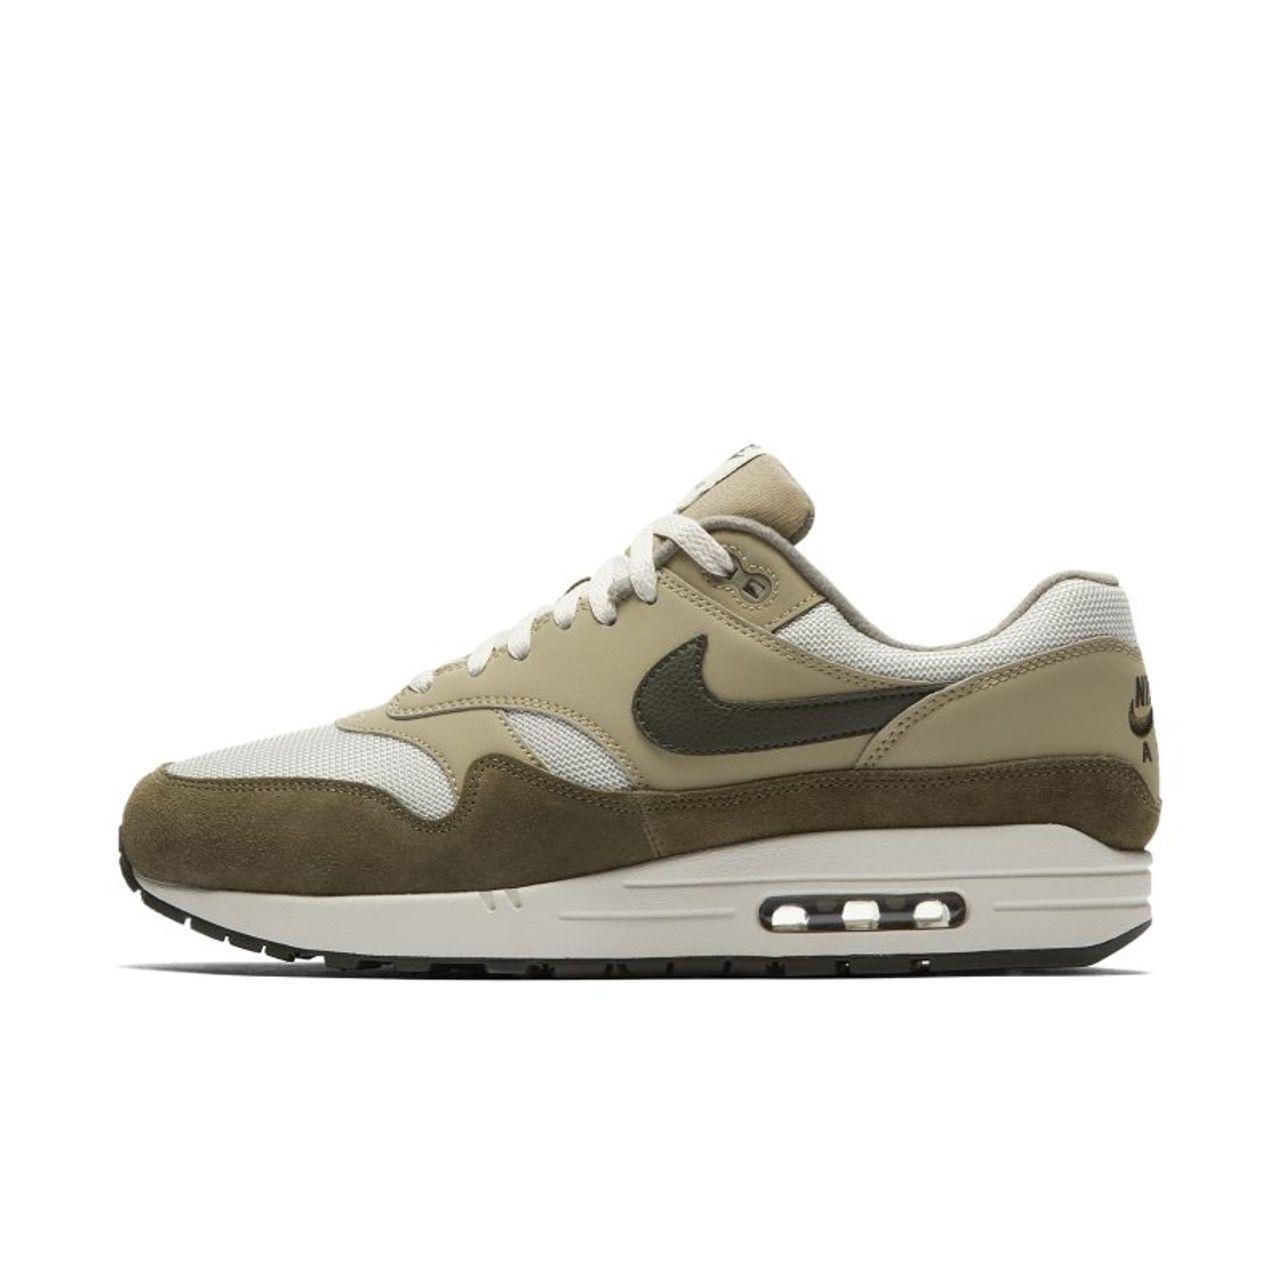 more photos 690a4 4549f Nike Air Max 1 Herenschoen - Olive AH8145-201 - Vergelijk pr